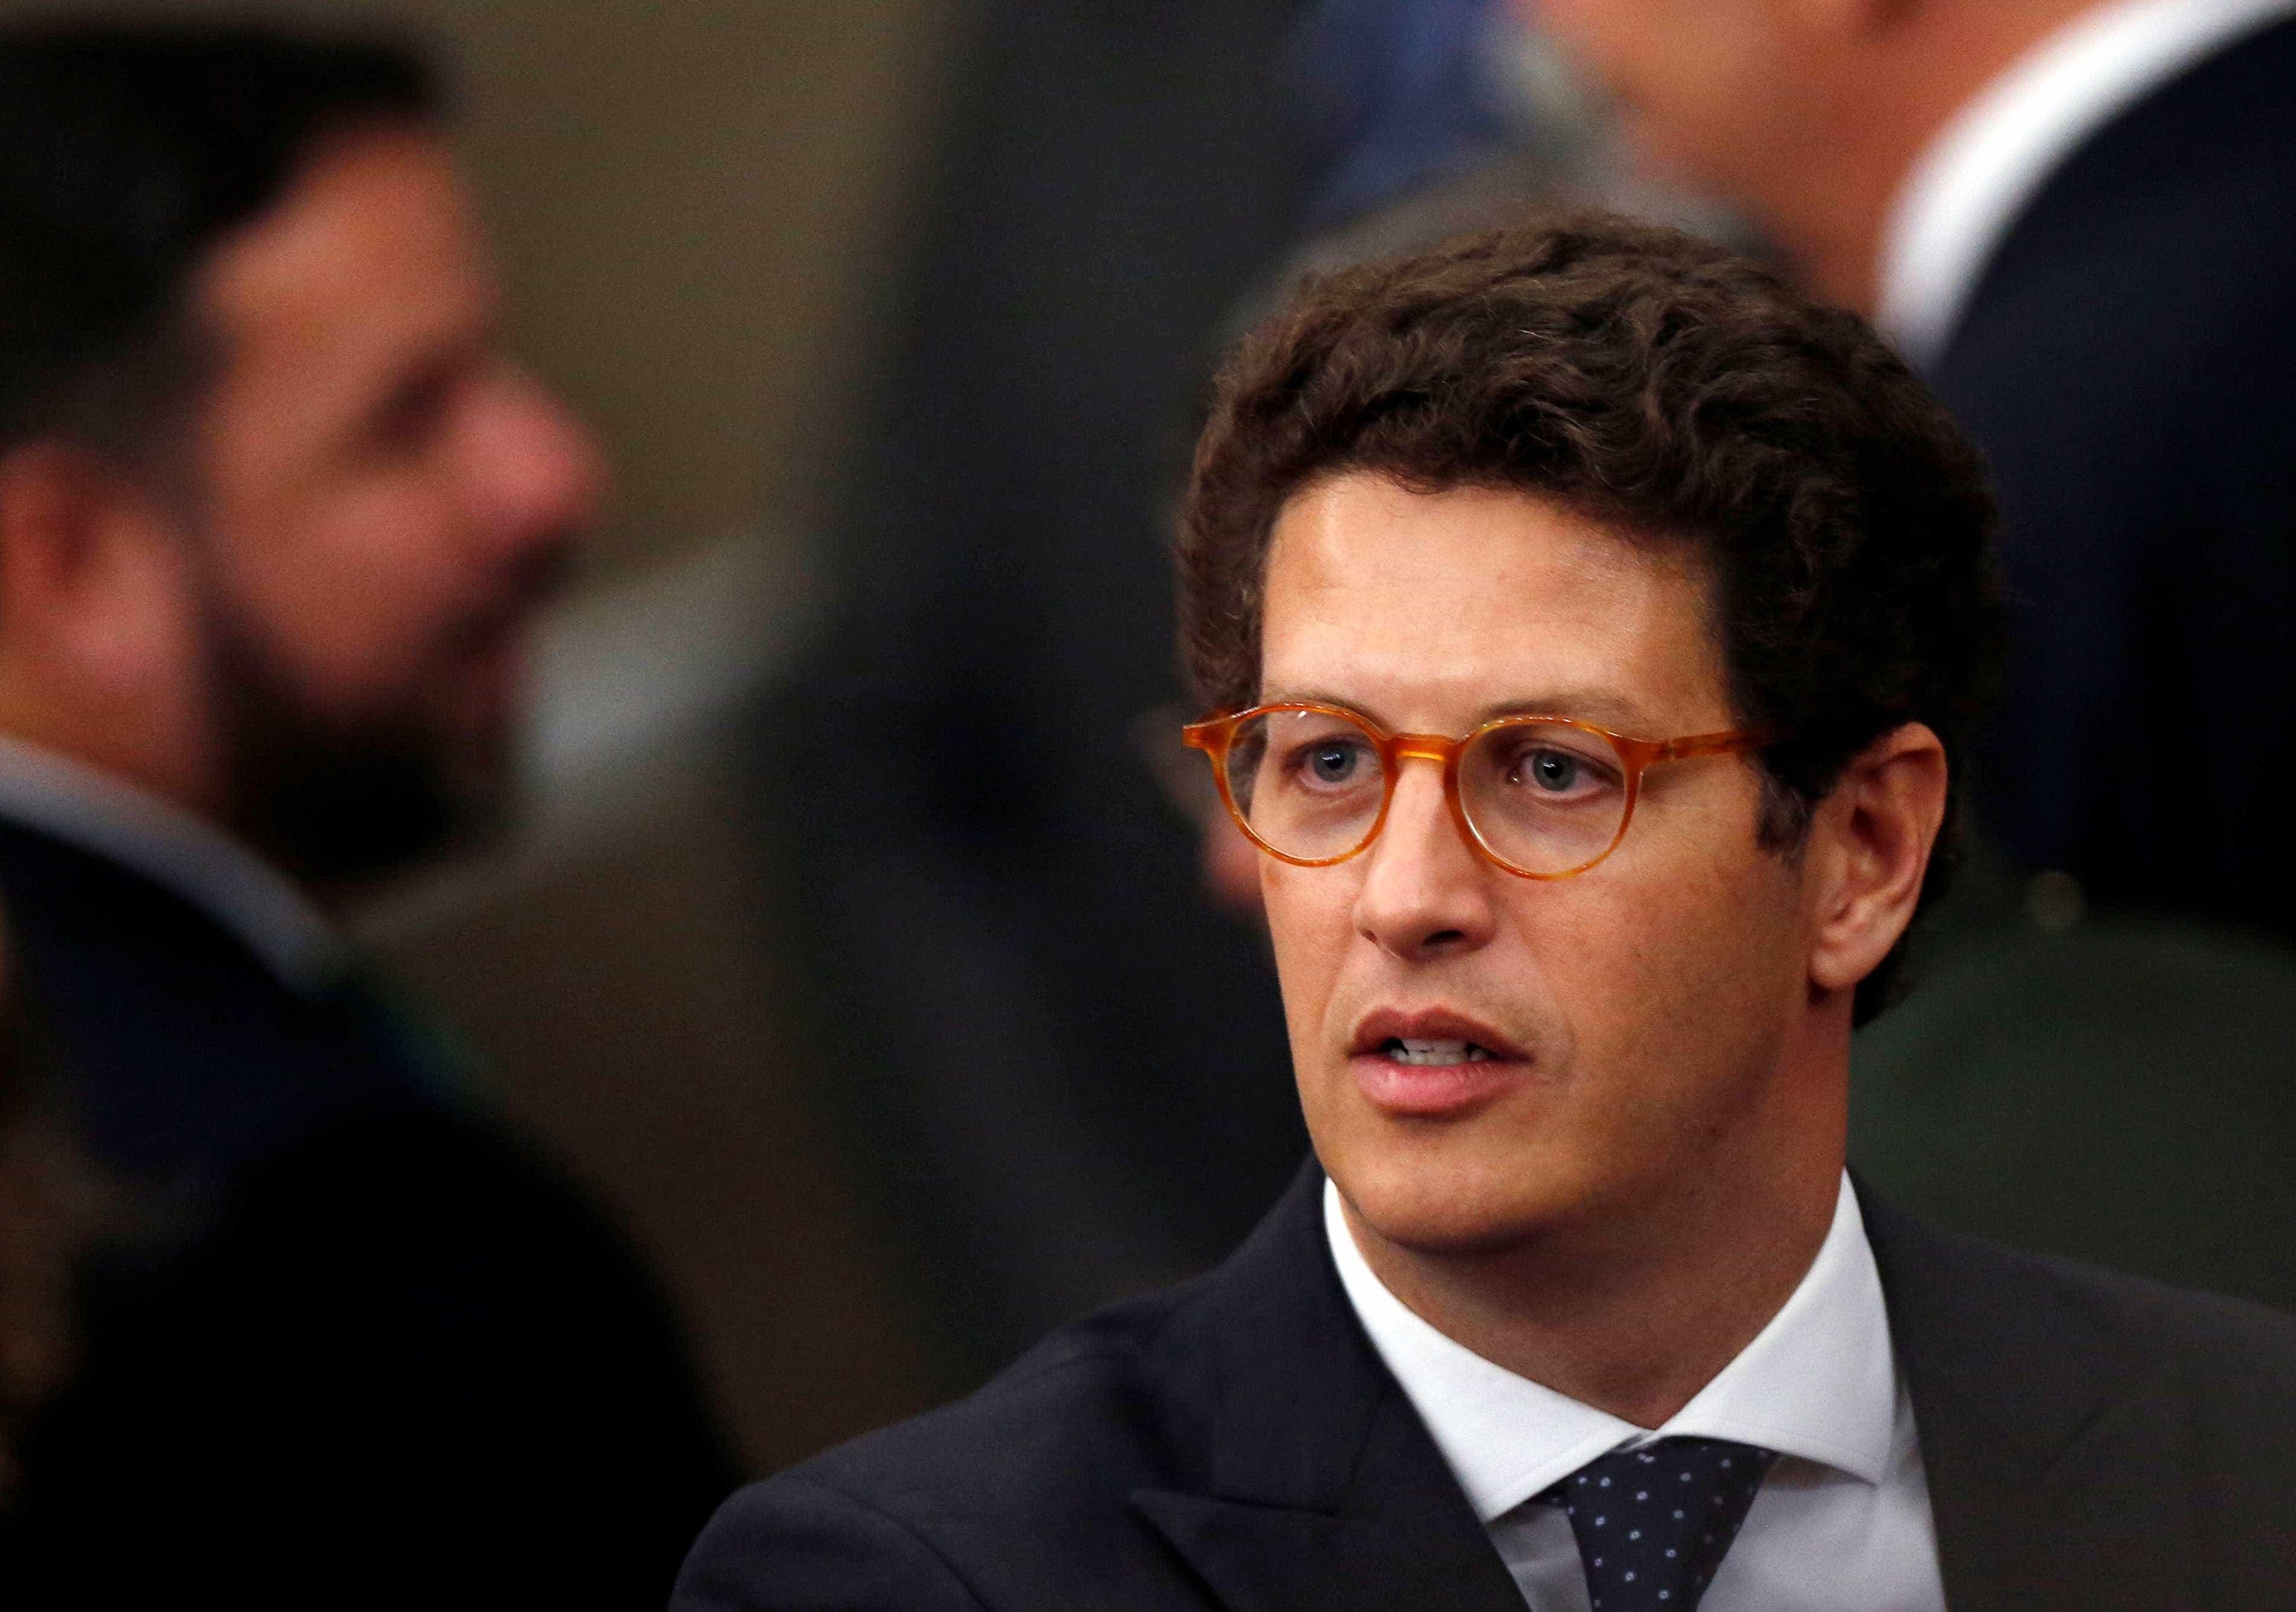 Ministro do Meio Ambiente, Ricardo Salles desdenha Chico Mendes